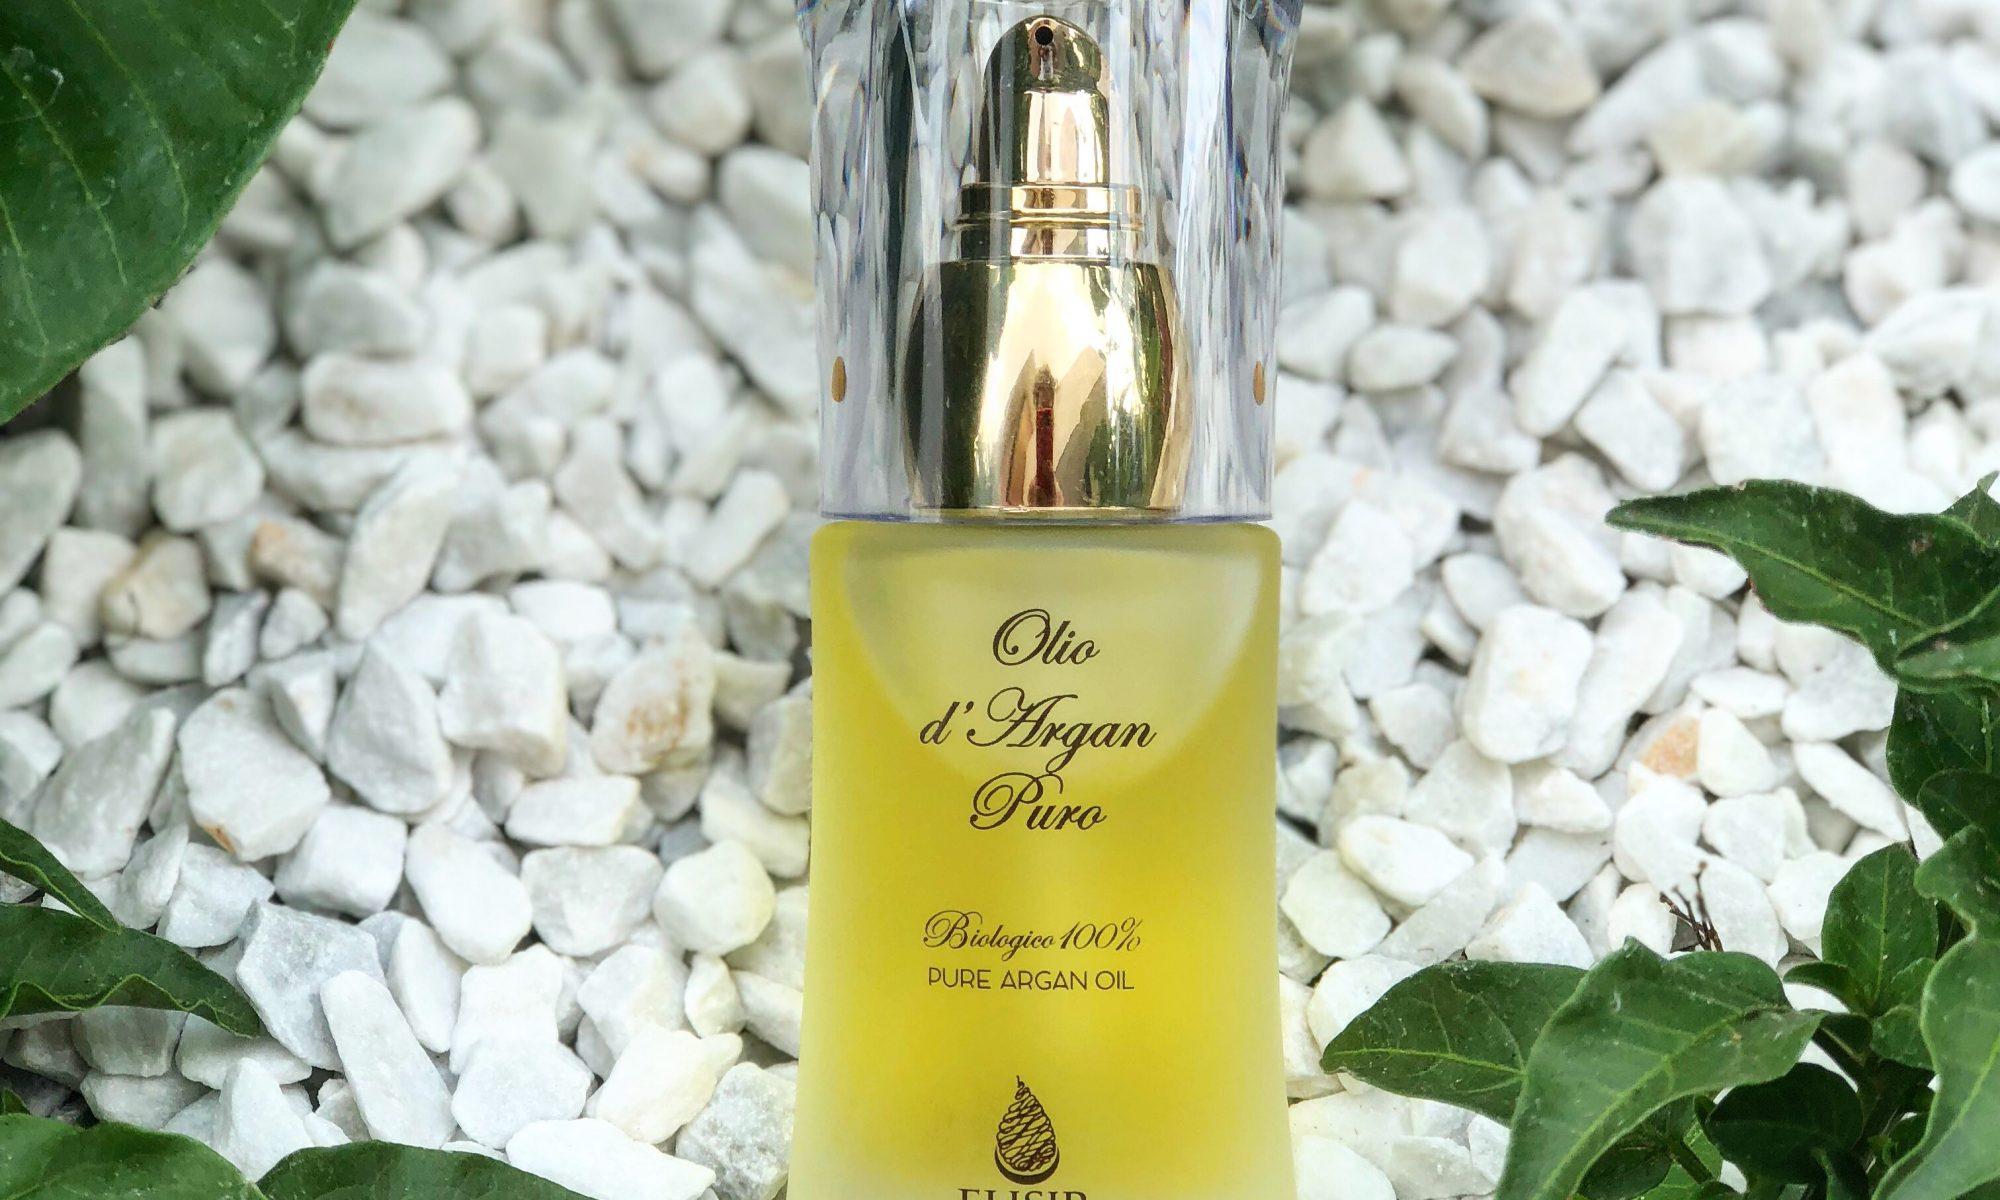 Olio d'Argan | Elisirdargan.com